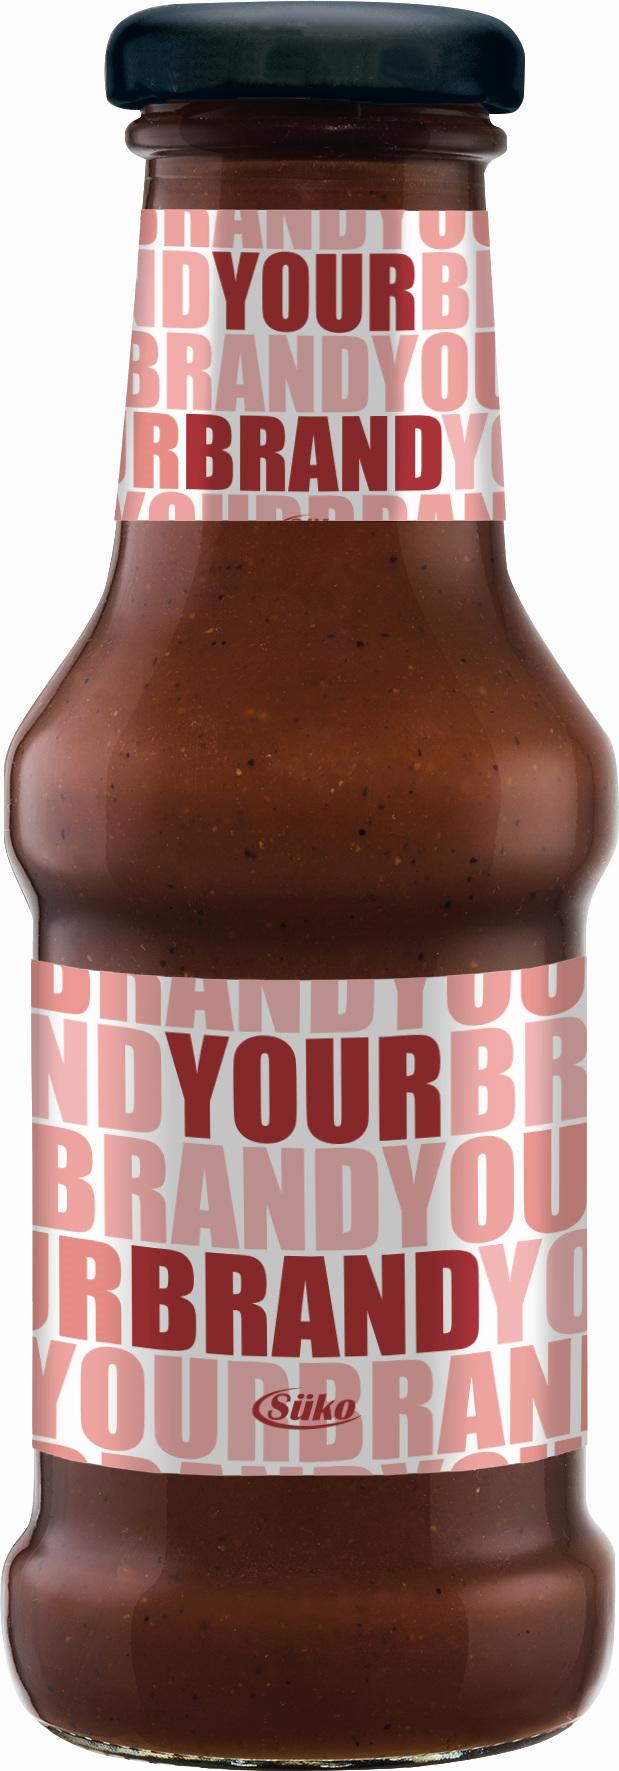 Süko 250ml sauces glass bottle 1